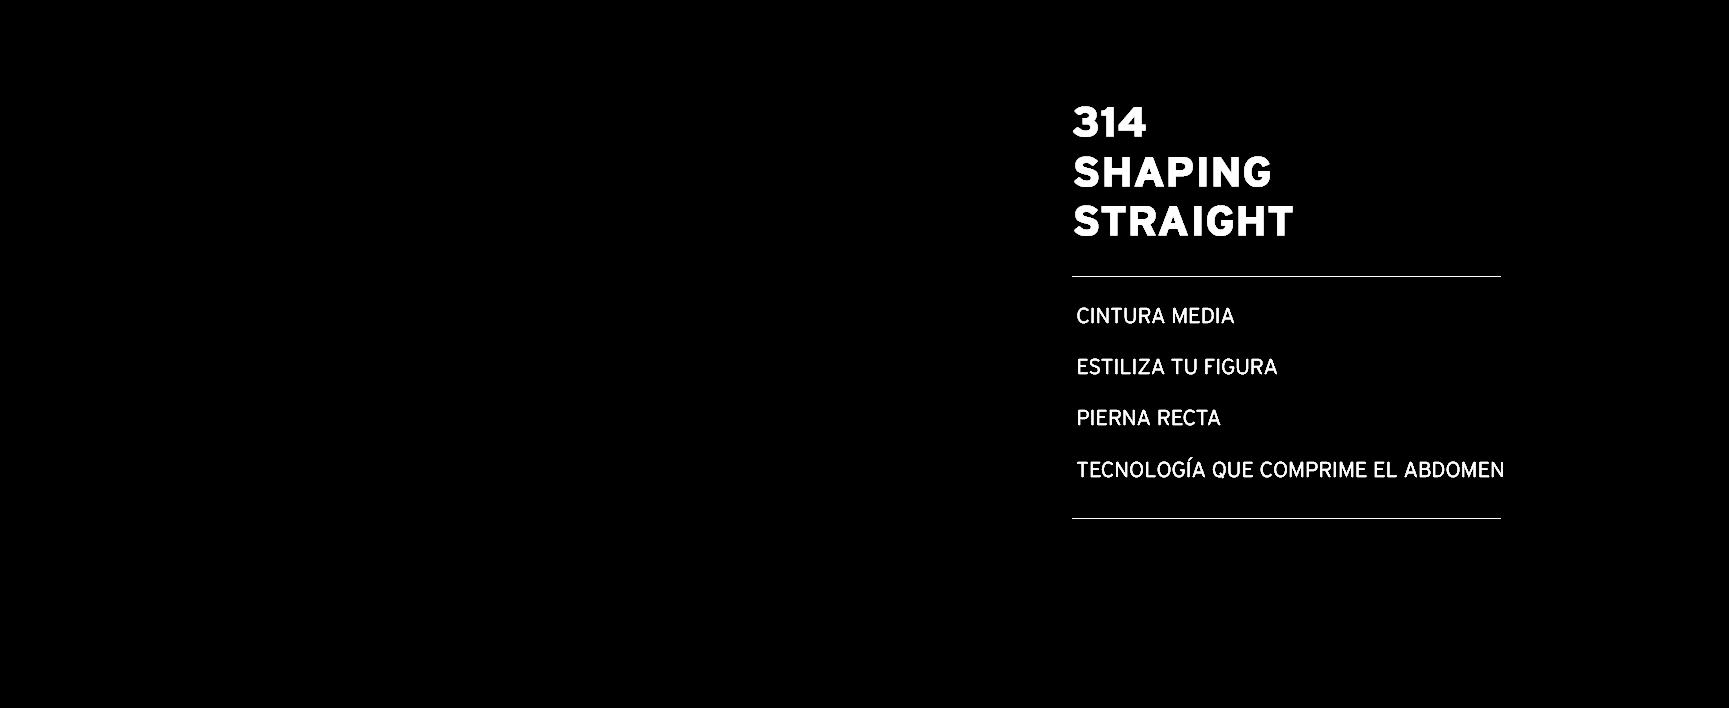 314 shaping straight